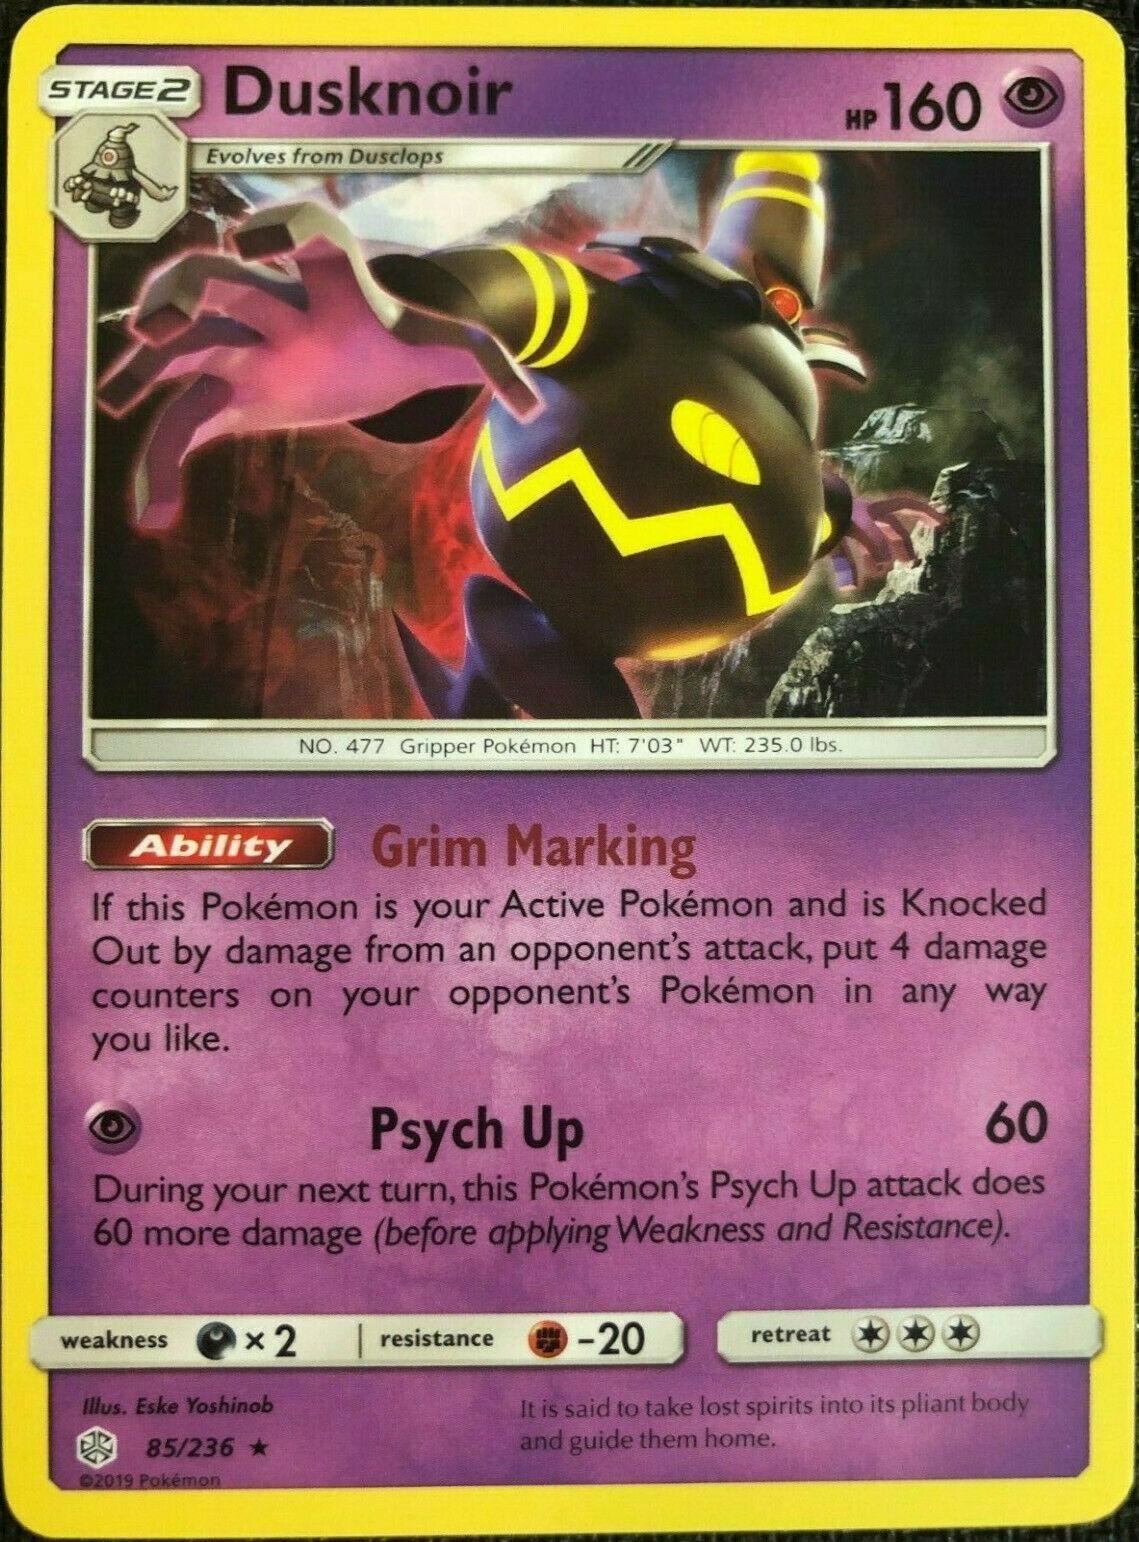 ~Pokemon rare Holo Foil Dusknoir Card 85/236 Sm Cosmic Eclipse! - Image 1